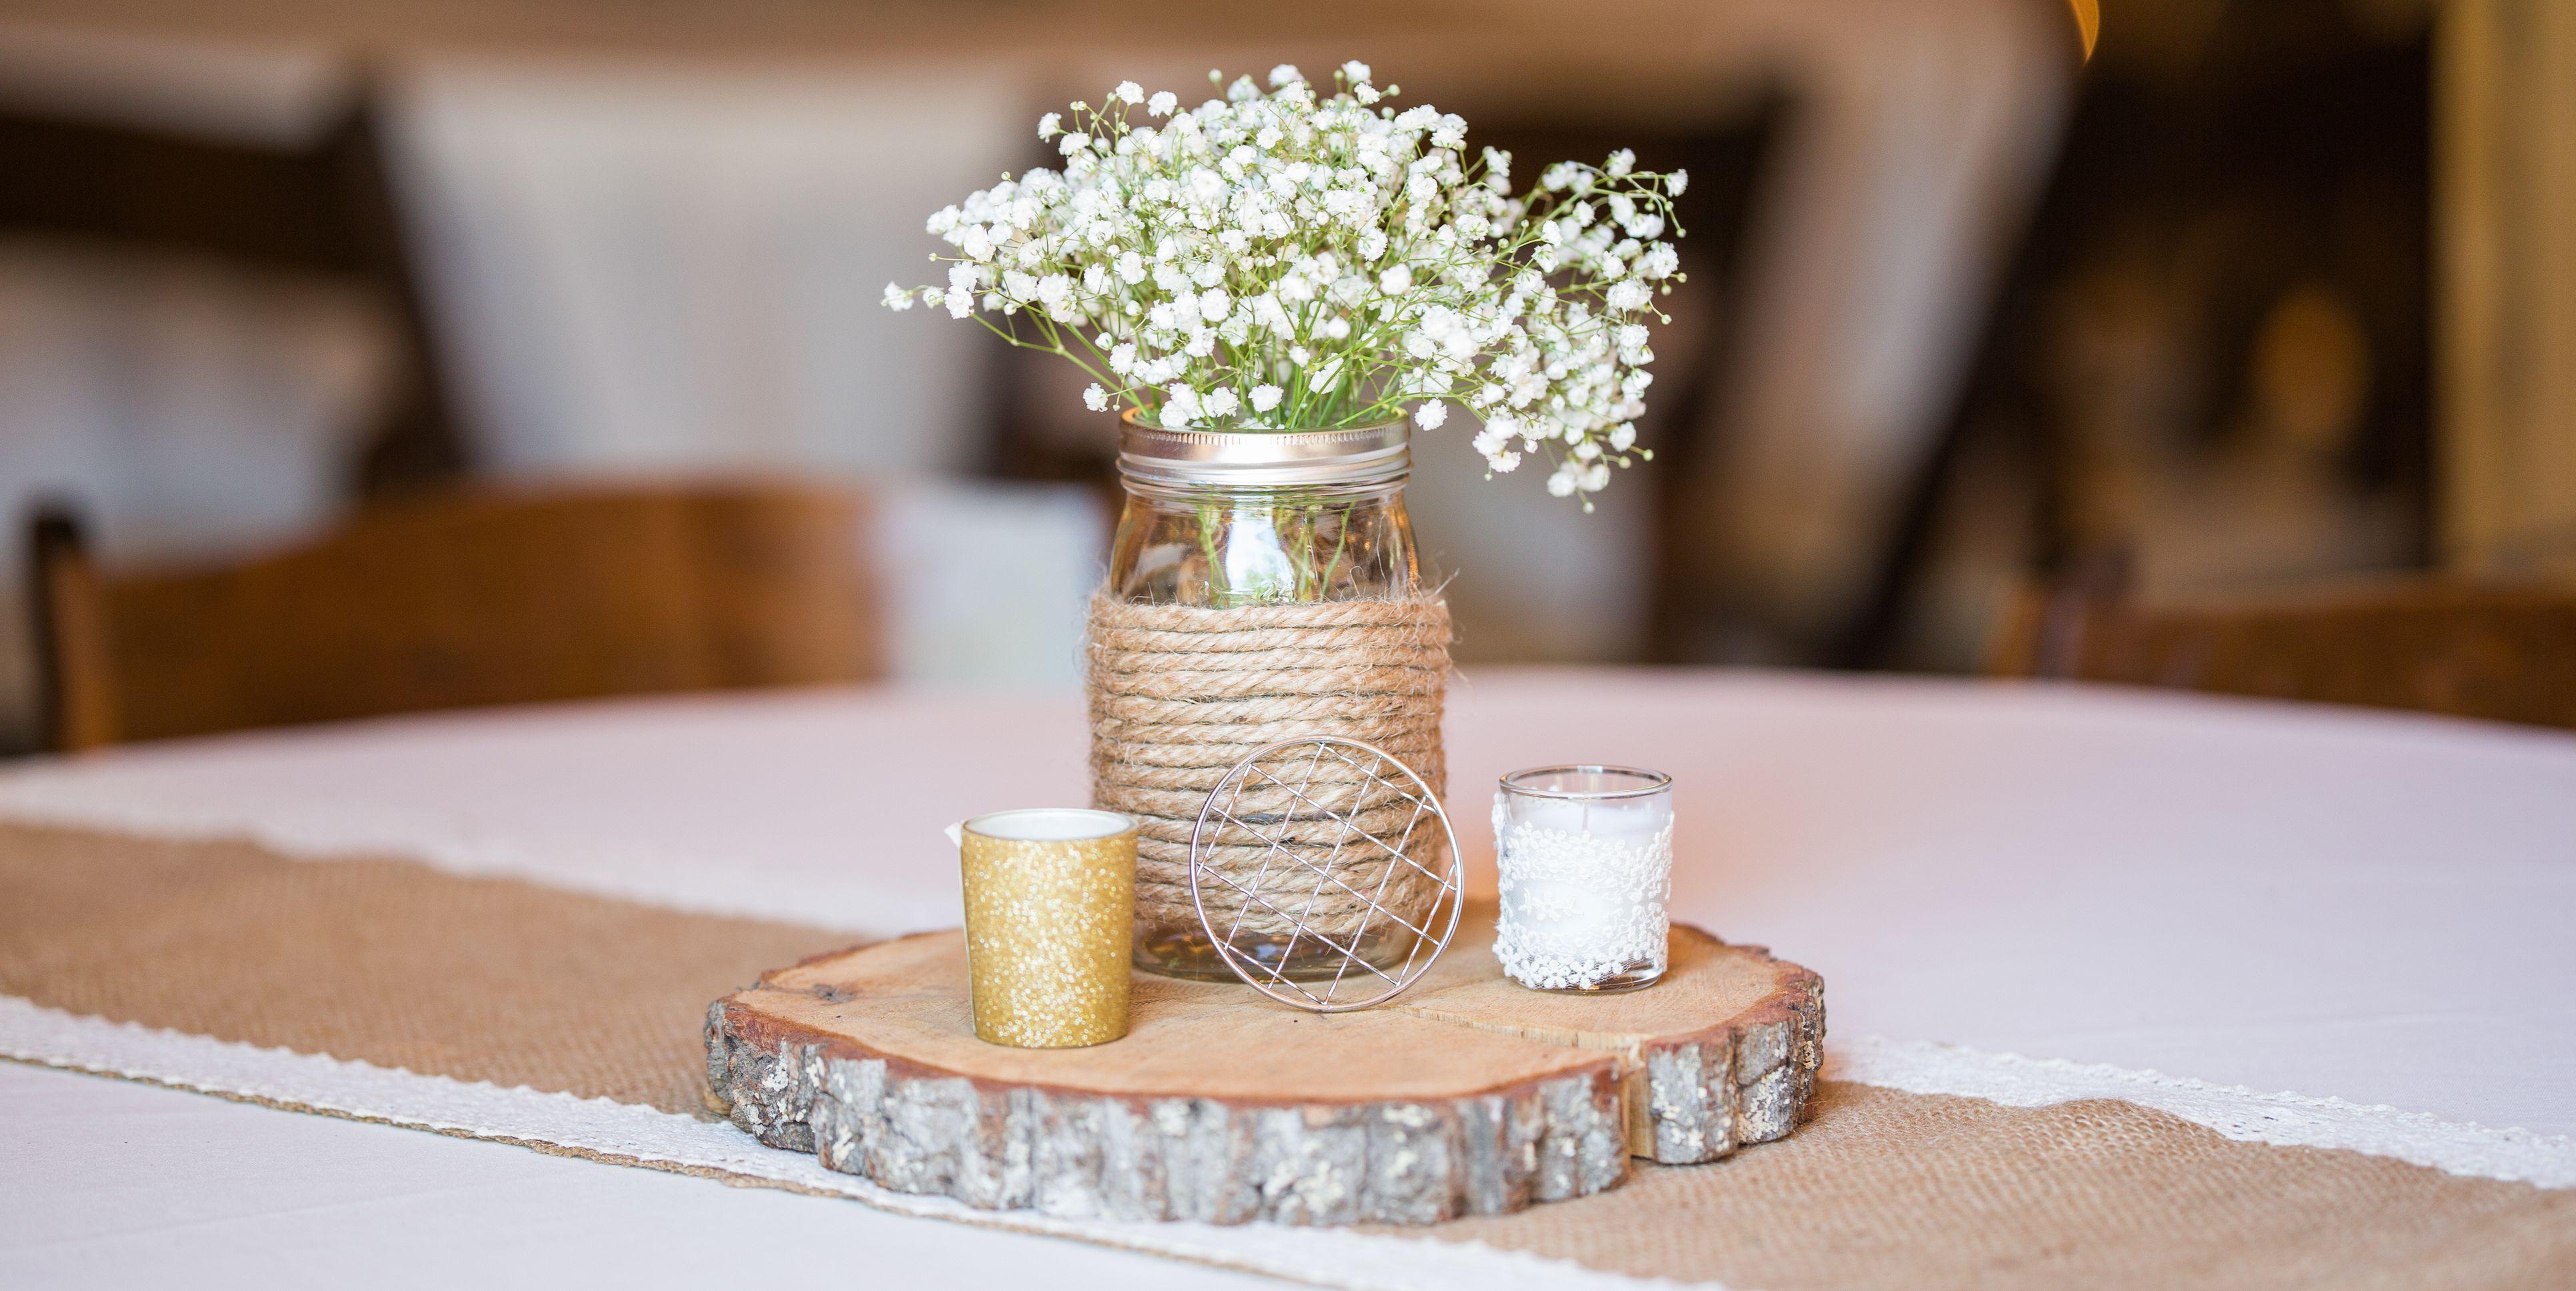 58 Great Mason Jar Ideas Easy Crafts And Decor For Mason Jars